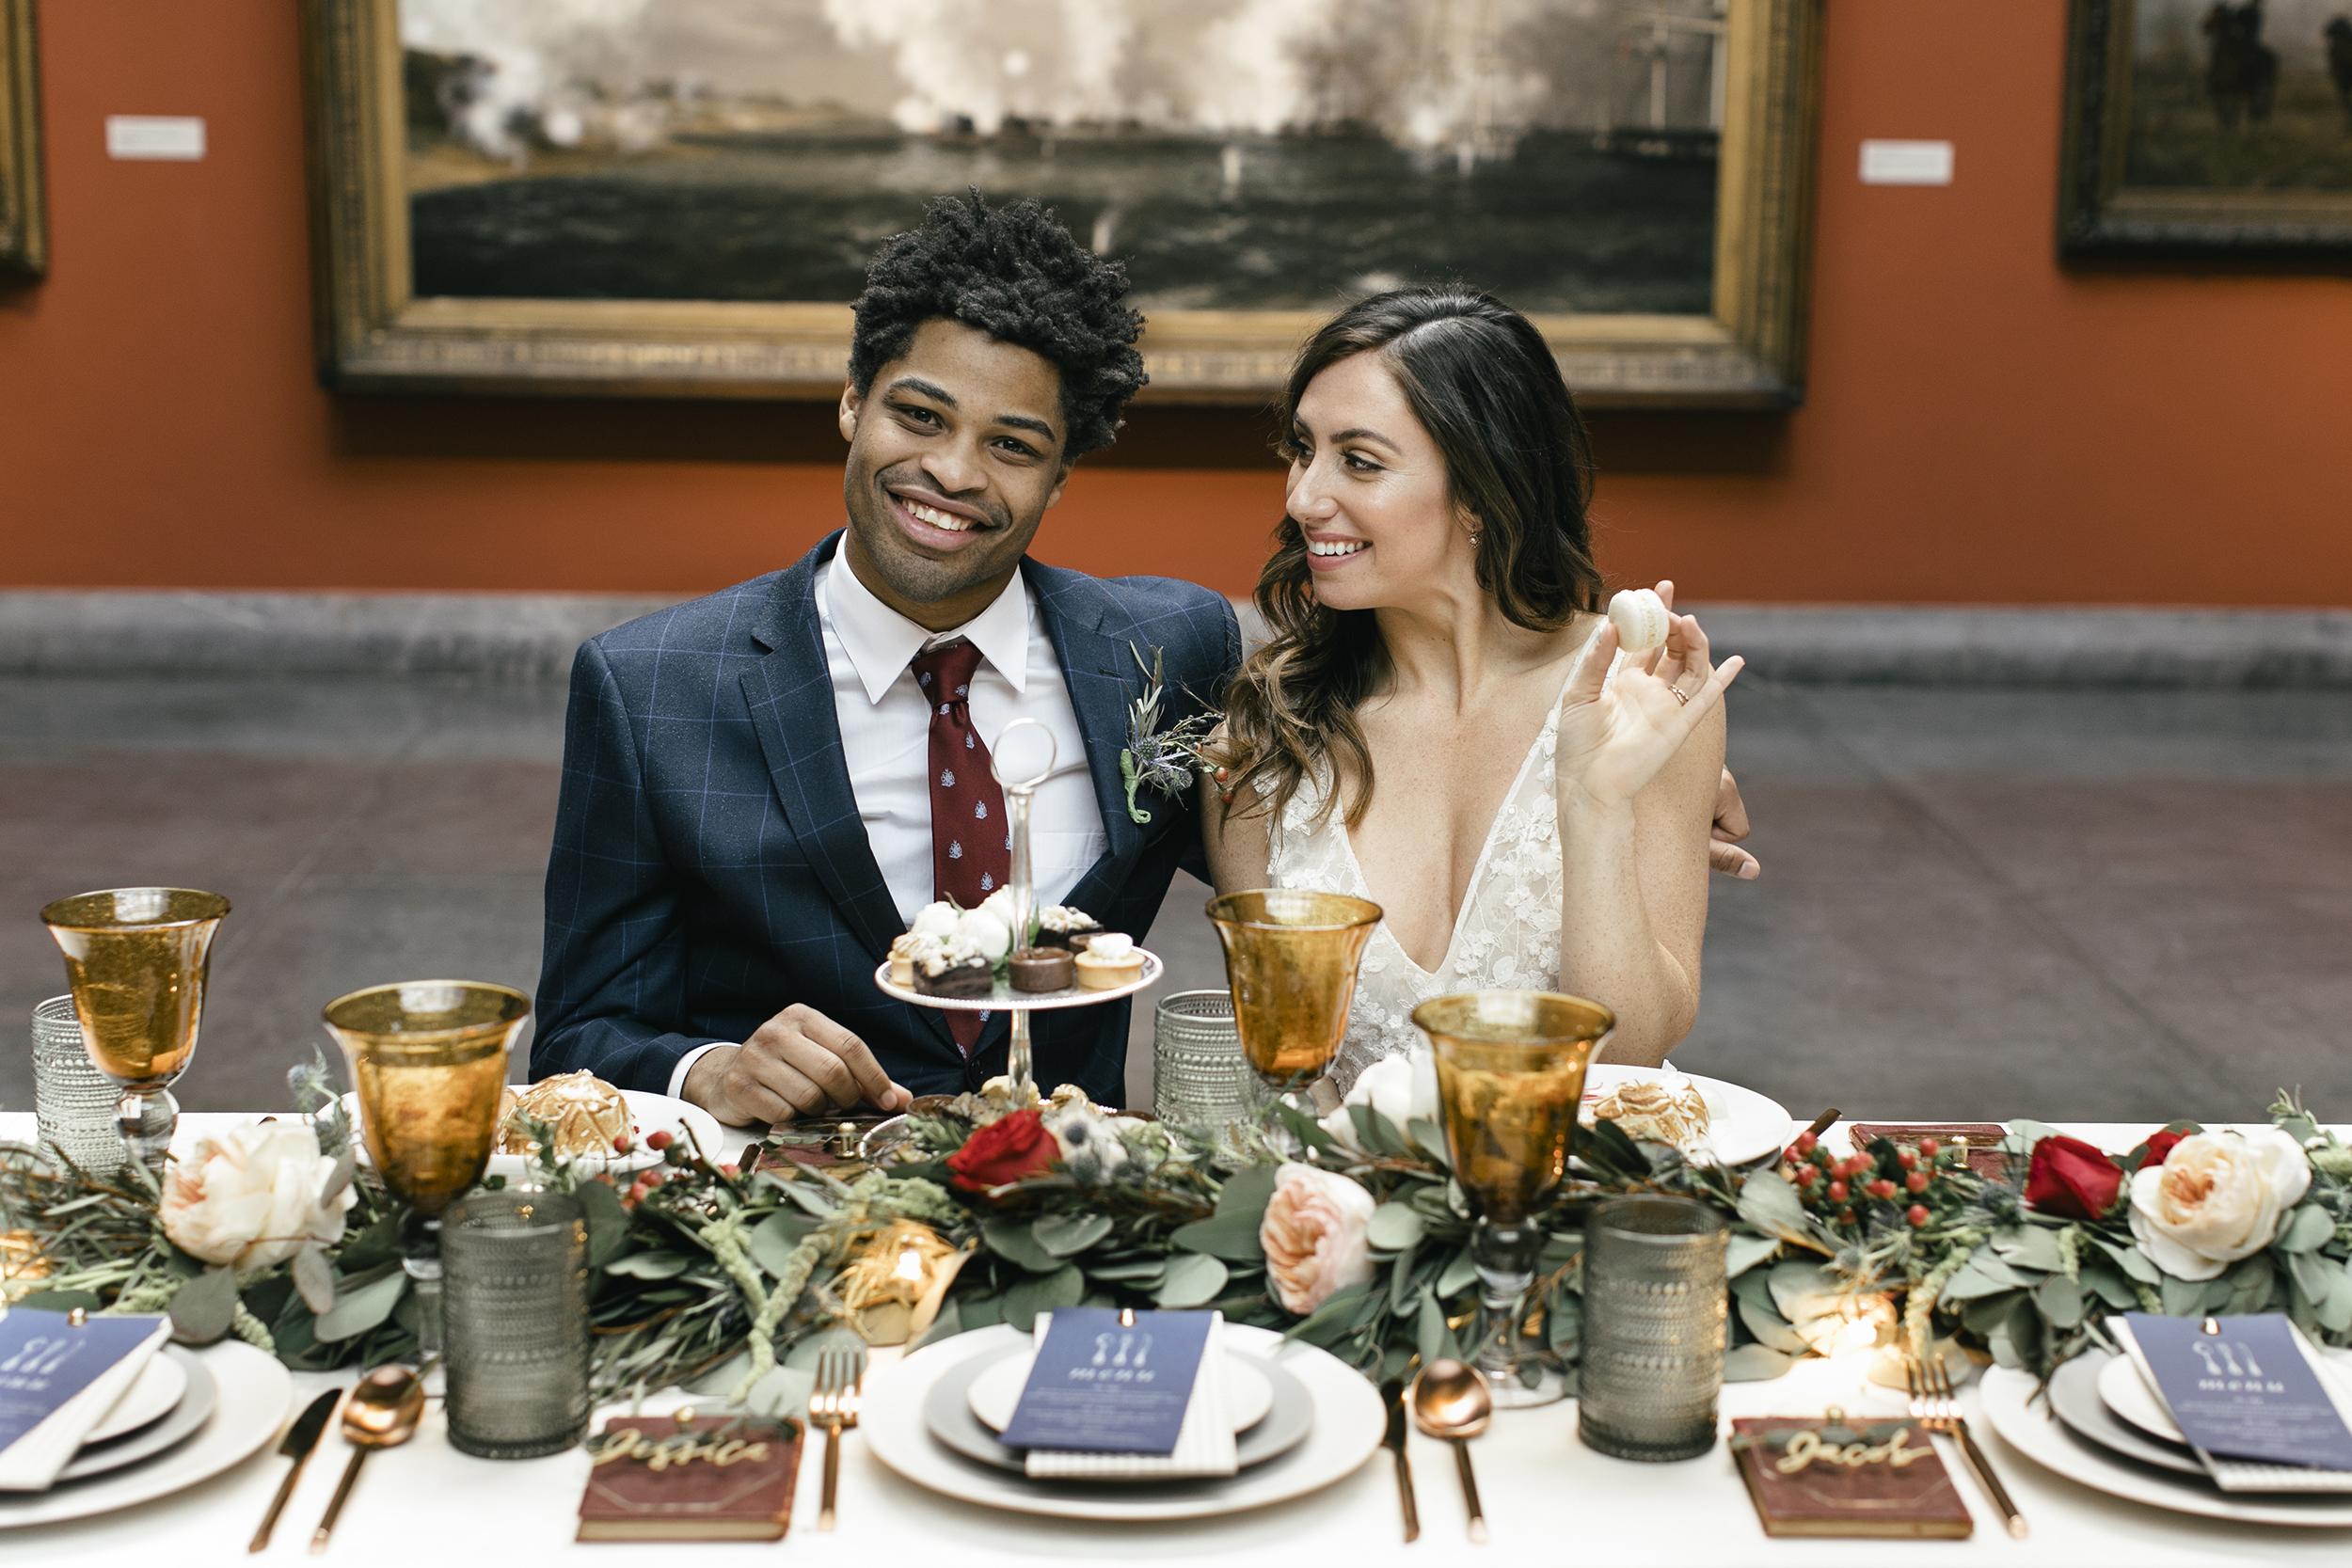 photography-wedding-weddings-natural-candid-pafa-pennsylvania academy-philadephia-philly-philadelphia wedding-mixed race-editorial-modern-fine-art-054.JPG